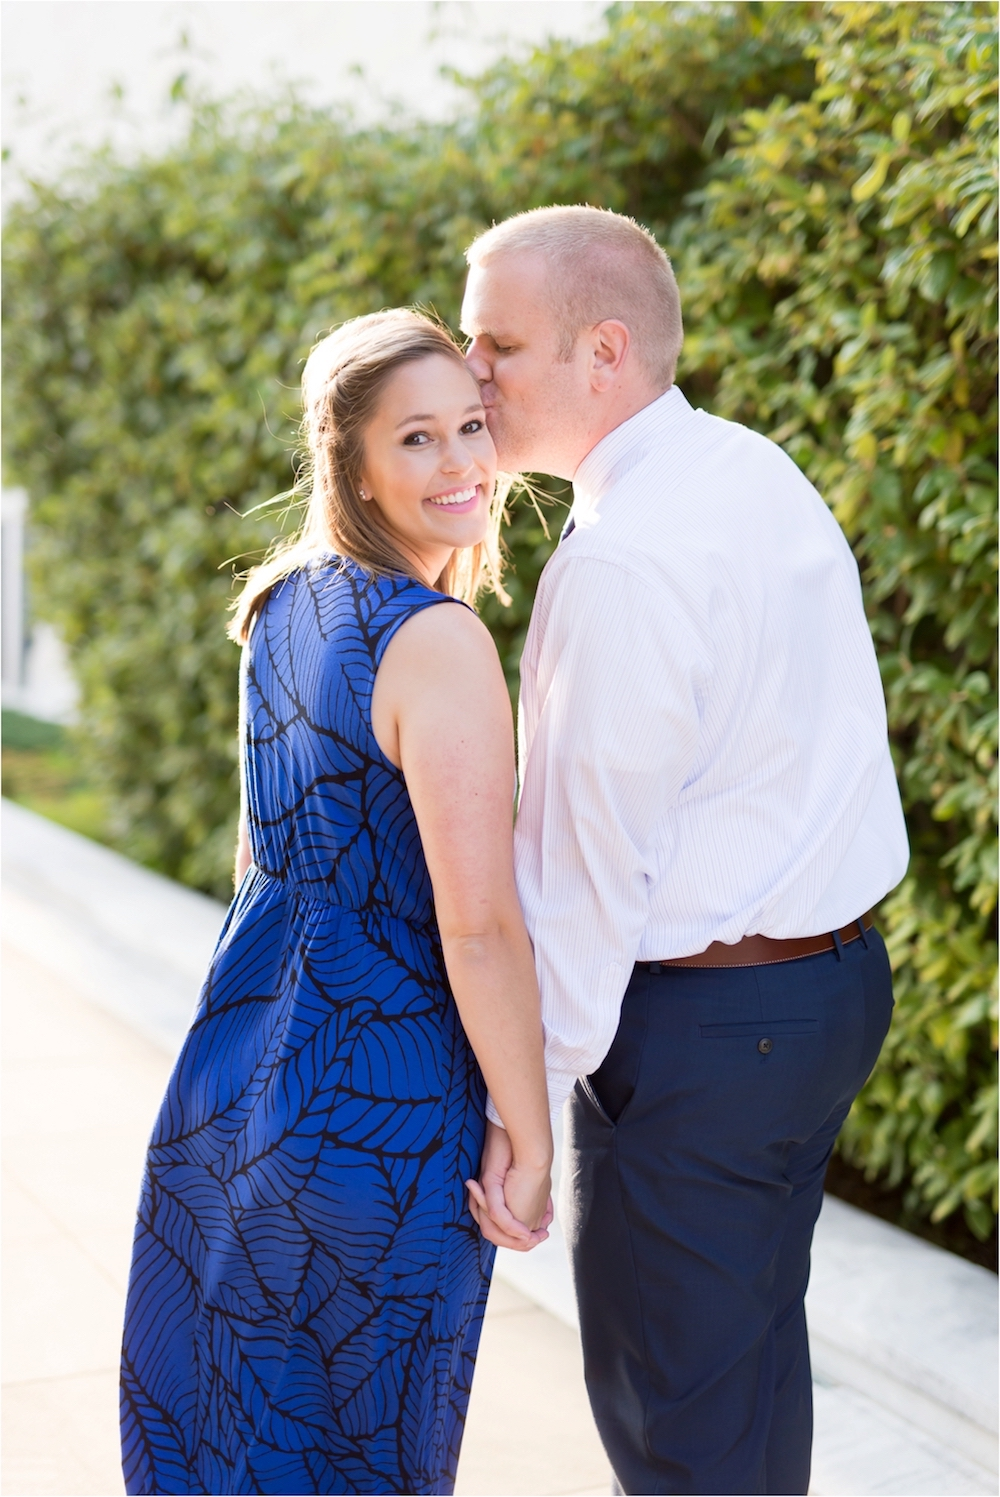 cleveland-museum-of-art-wedding-engagement-photo-8.jpg